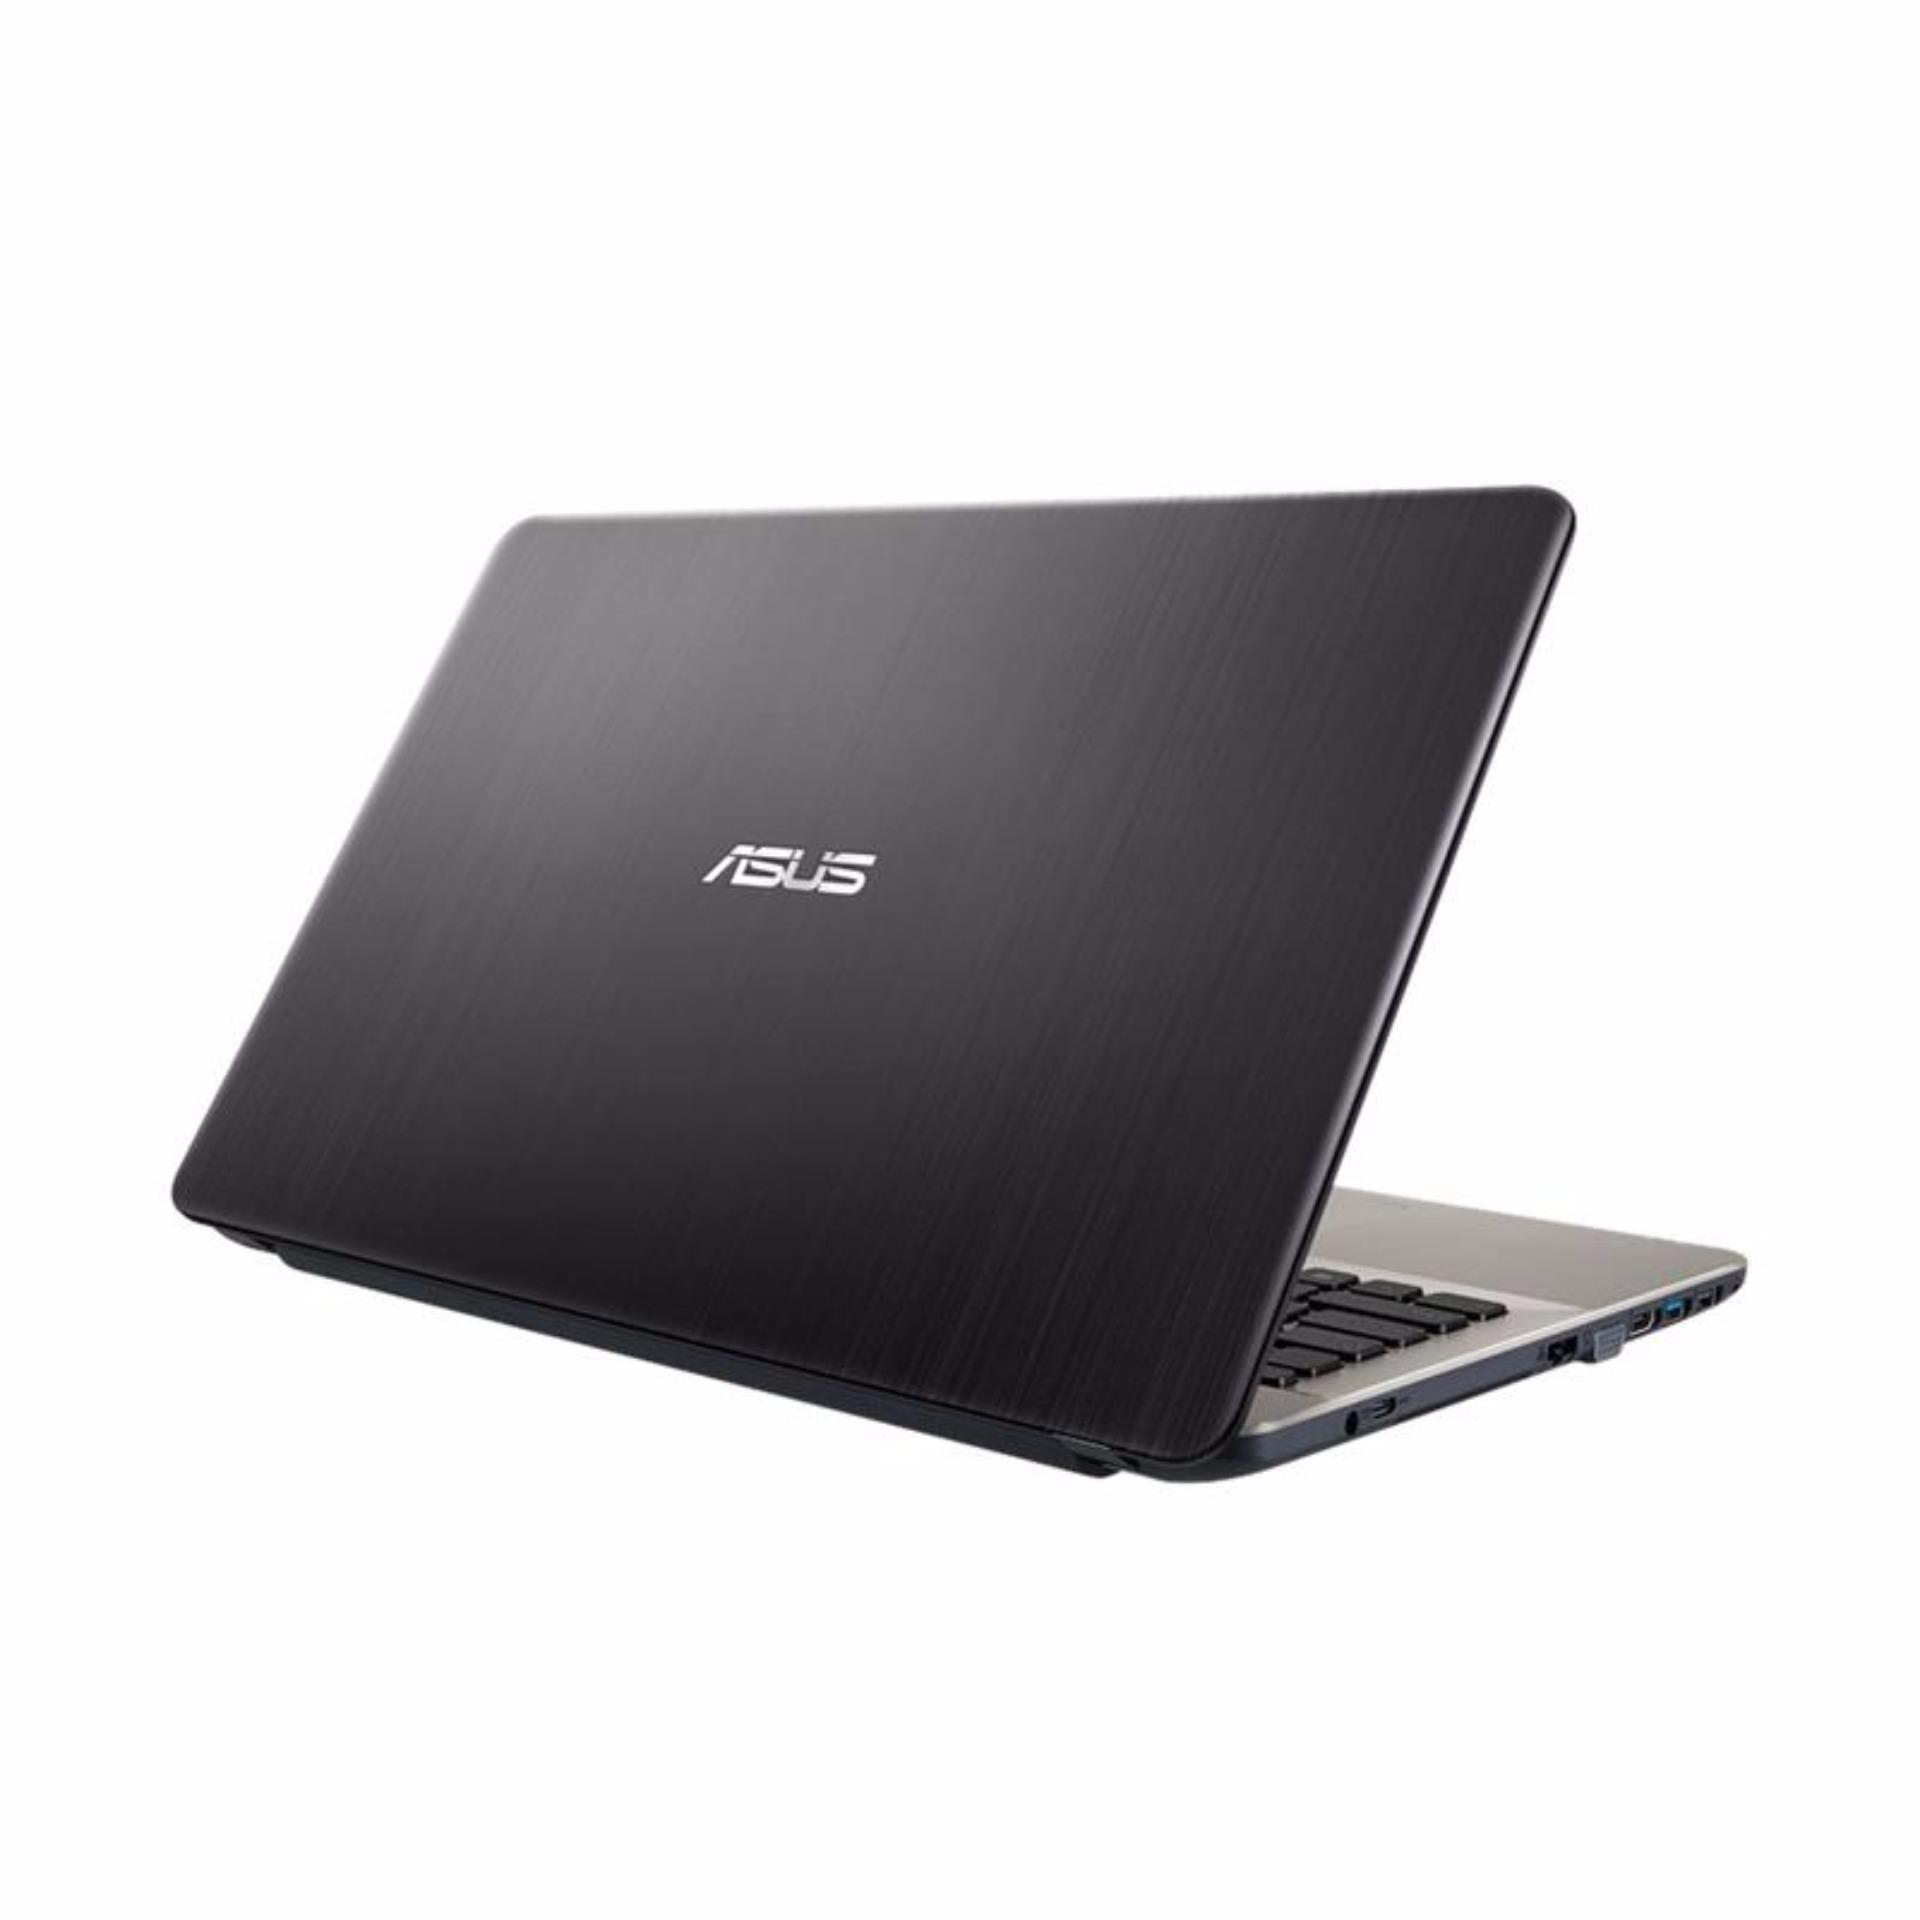 Dell Inspiron 3168 Processor N3710 4gb 500gb 116 Touch Win 10 Resmi Asus Vivobook Flip Tp201sa Fv0027d Laptop Gold Inch Hd Qc Dos X441na Bx401t Bx402t Bx403t Bx404t N3350